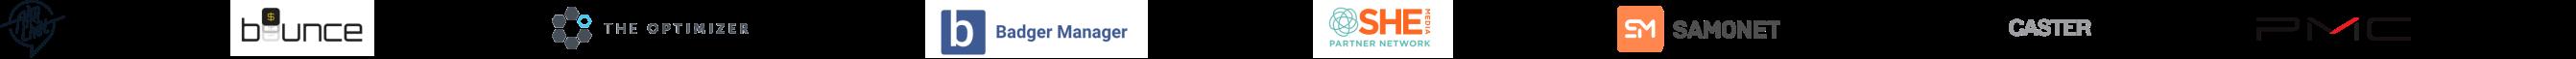 Project logos